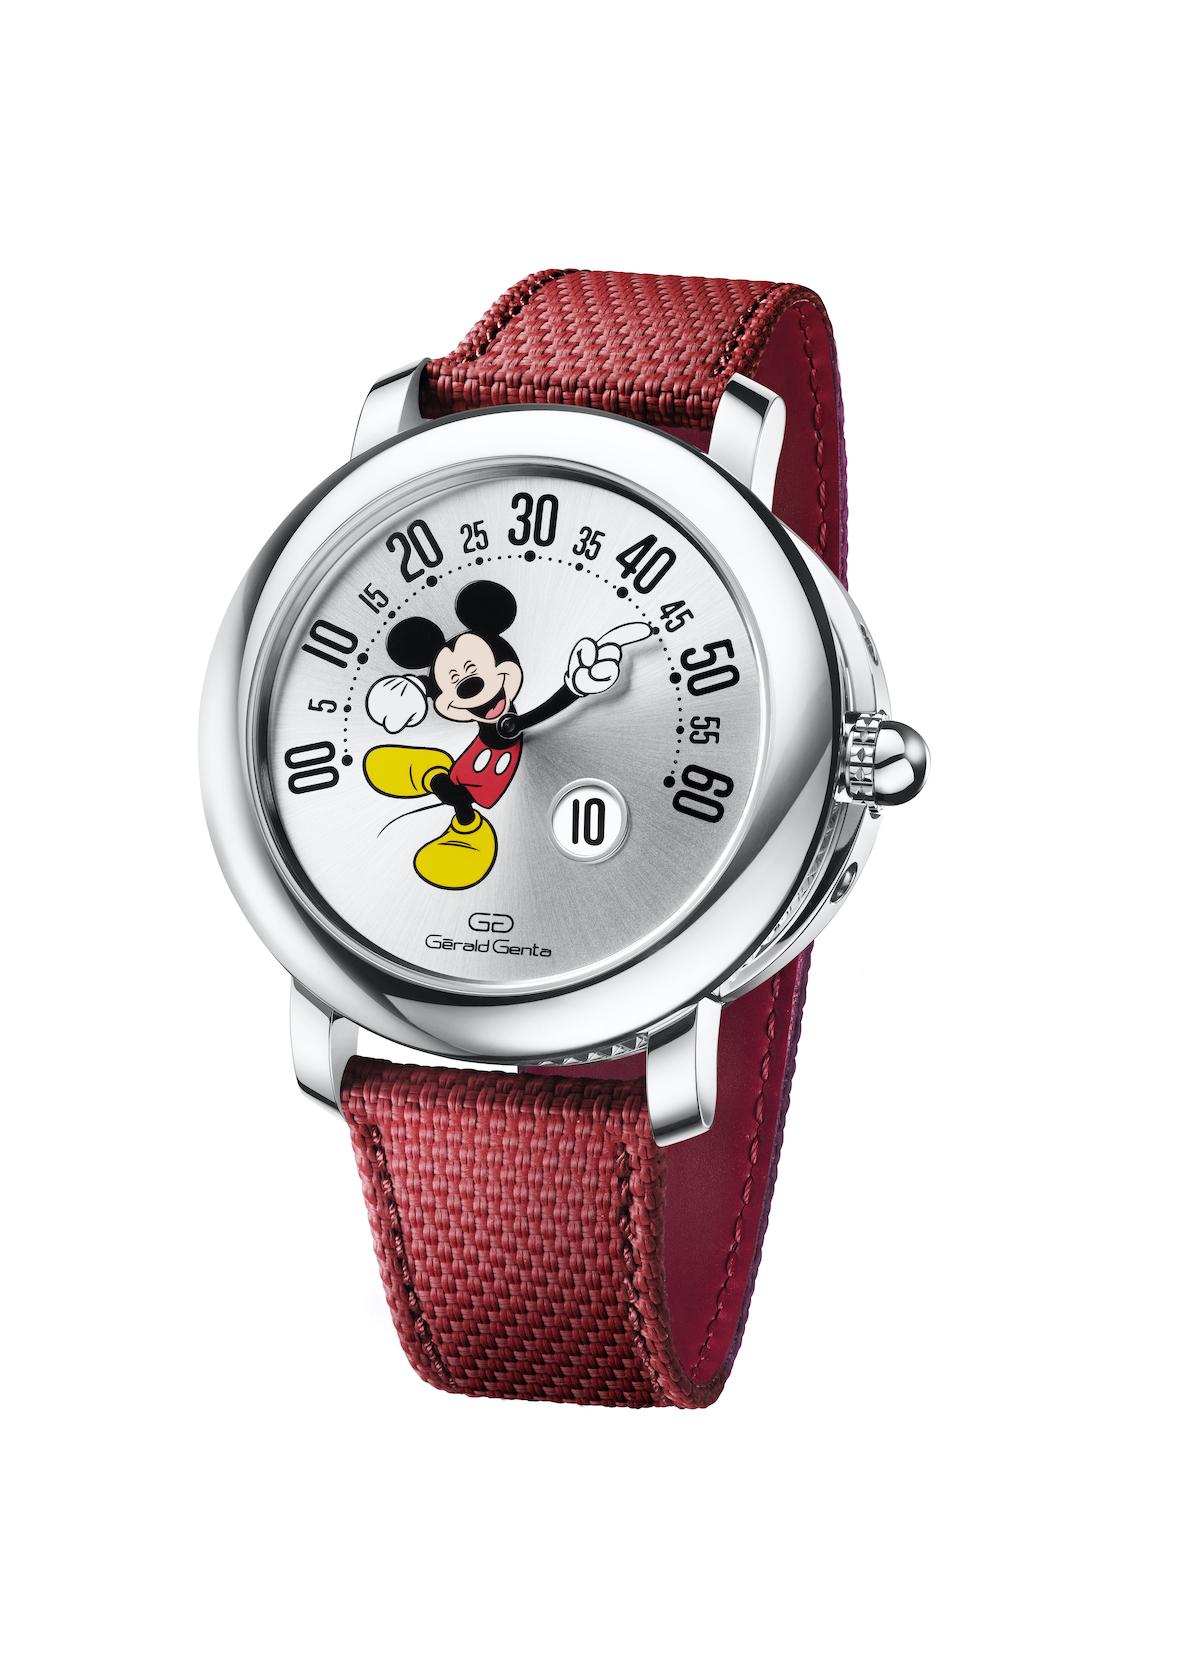 Gérald Genta Arena Retro Mickey Mouse Disney 2